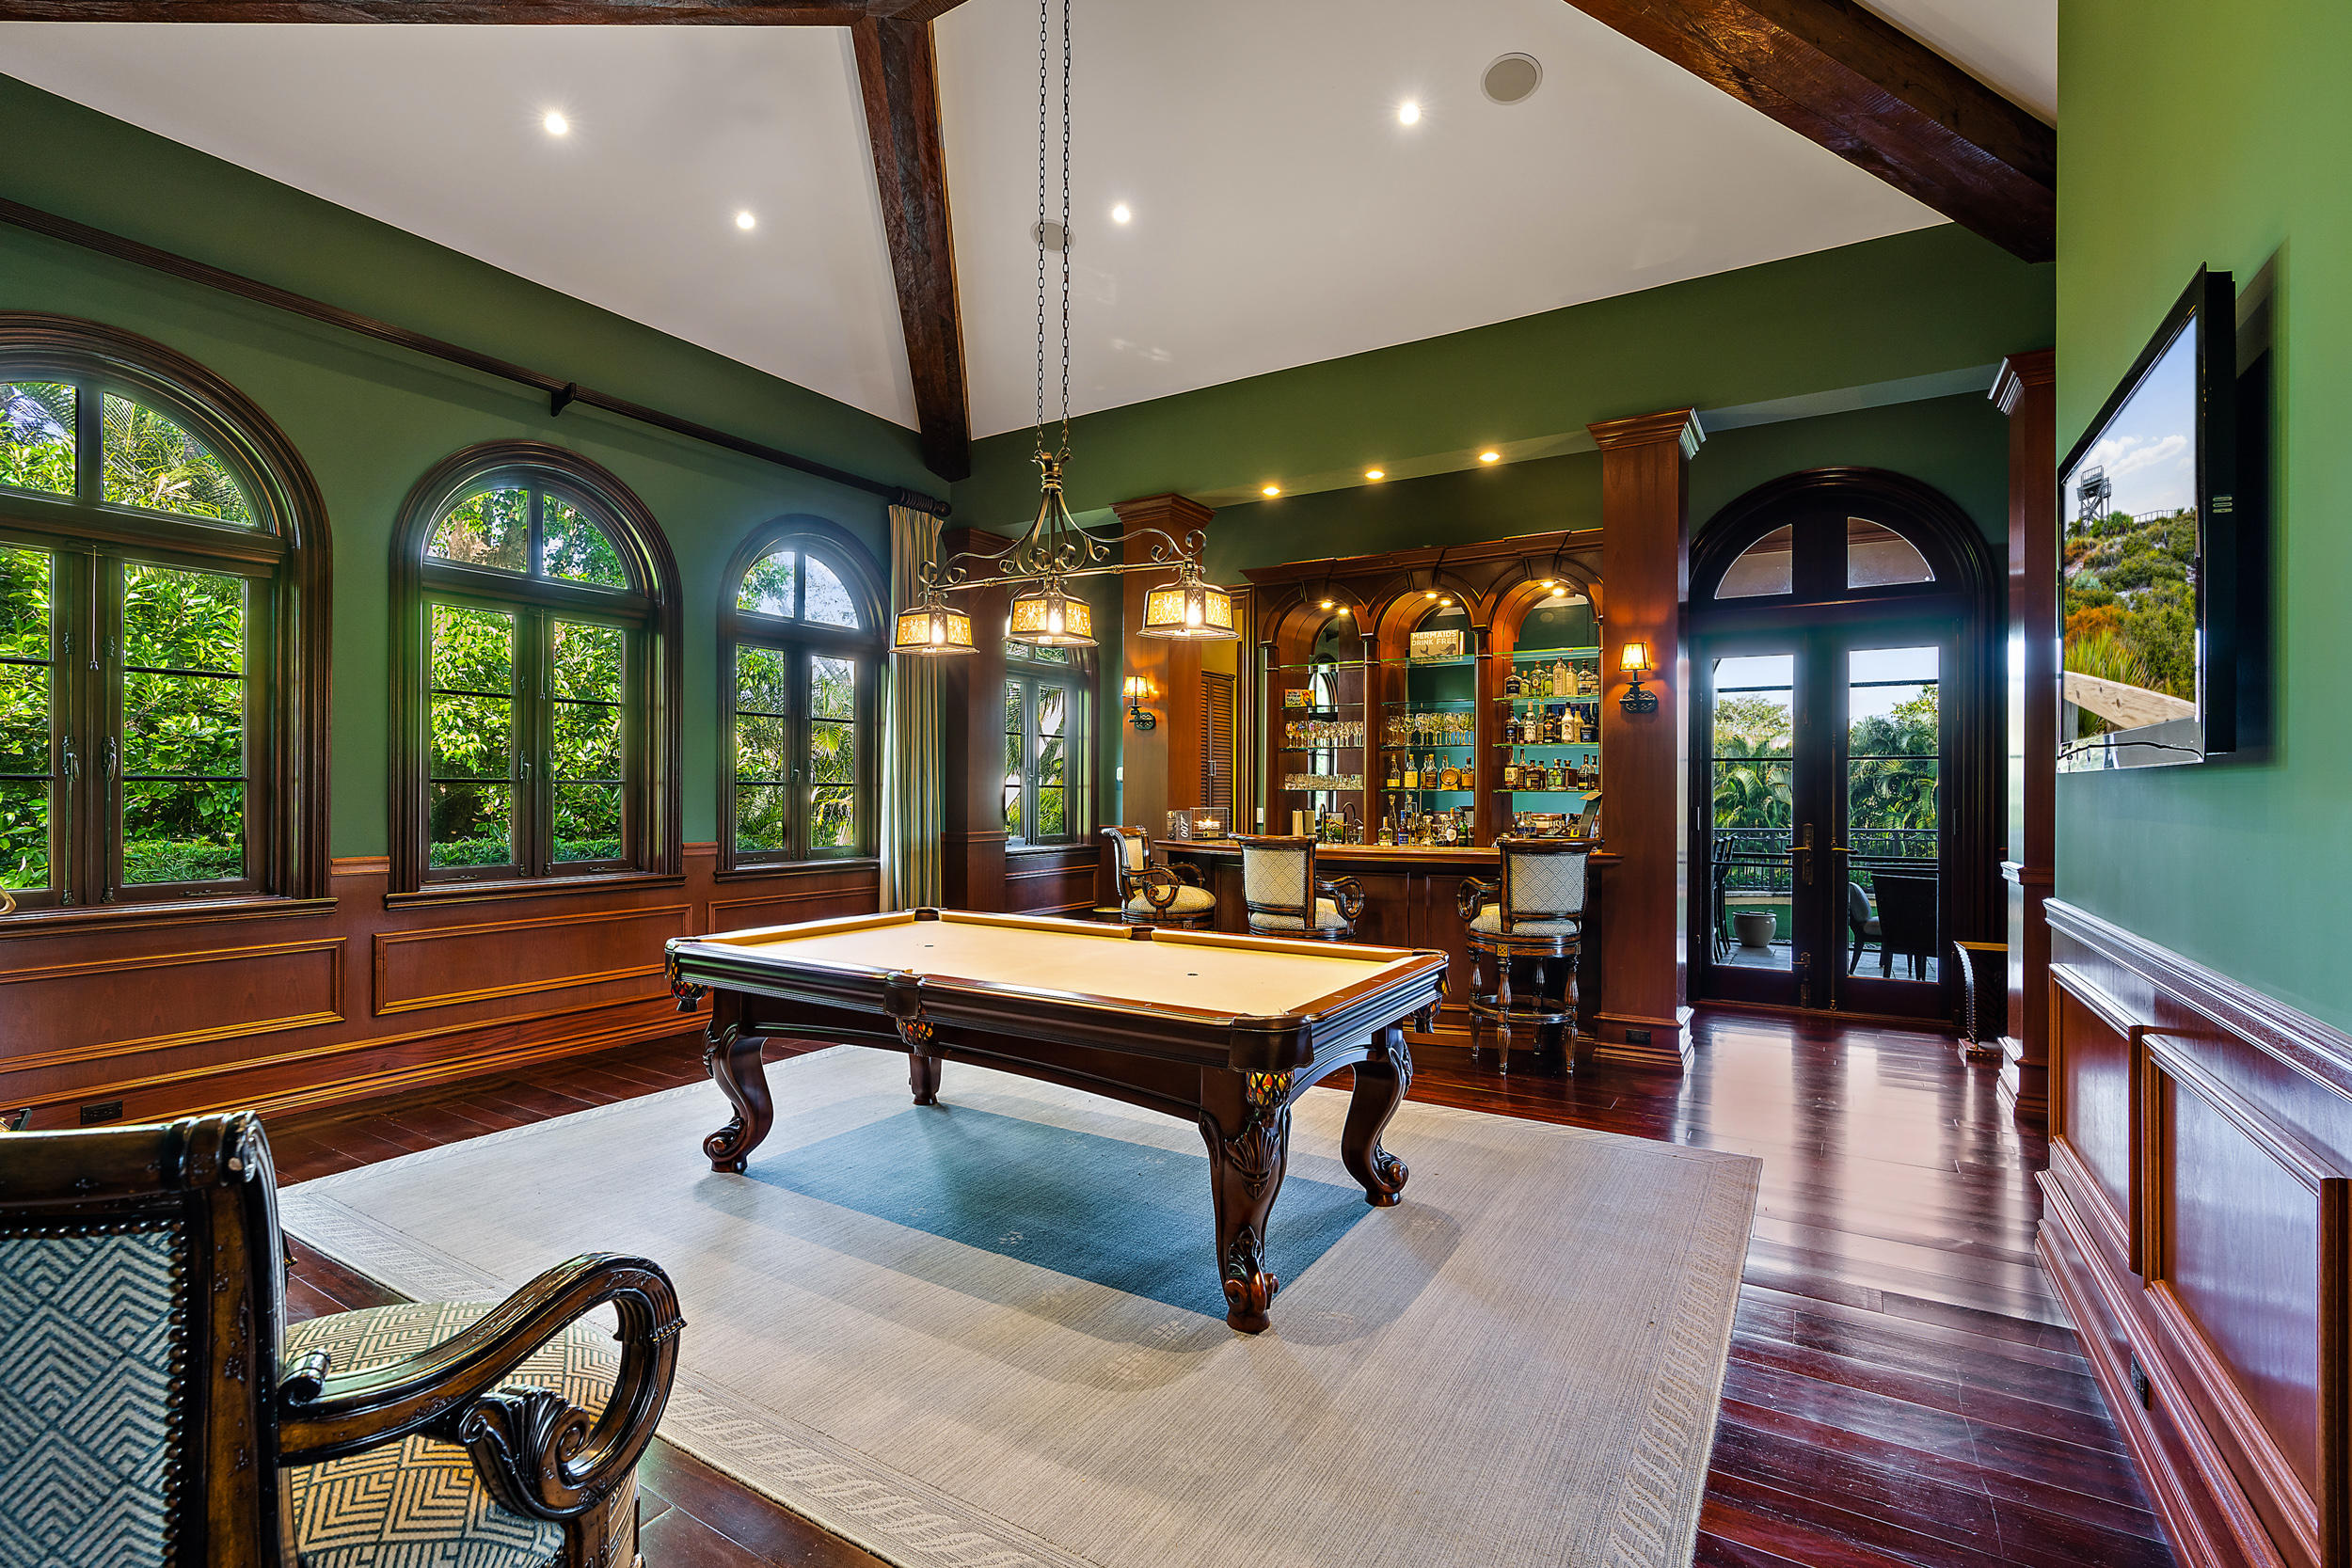 Game/Billiards Room